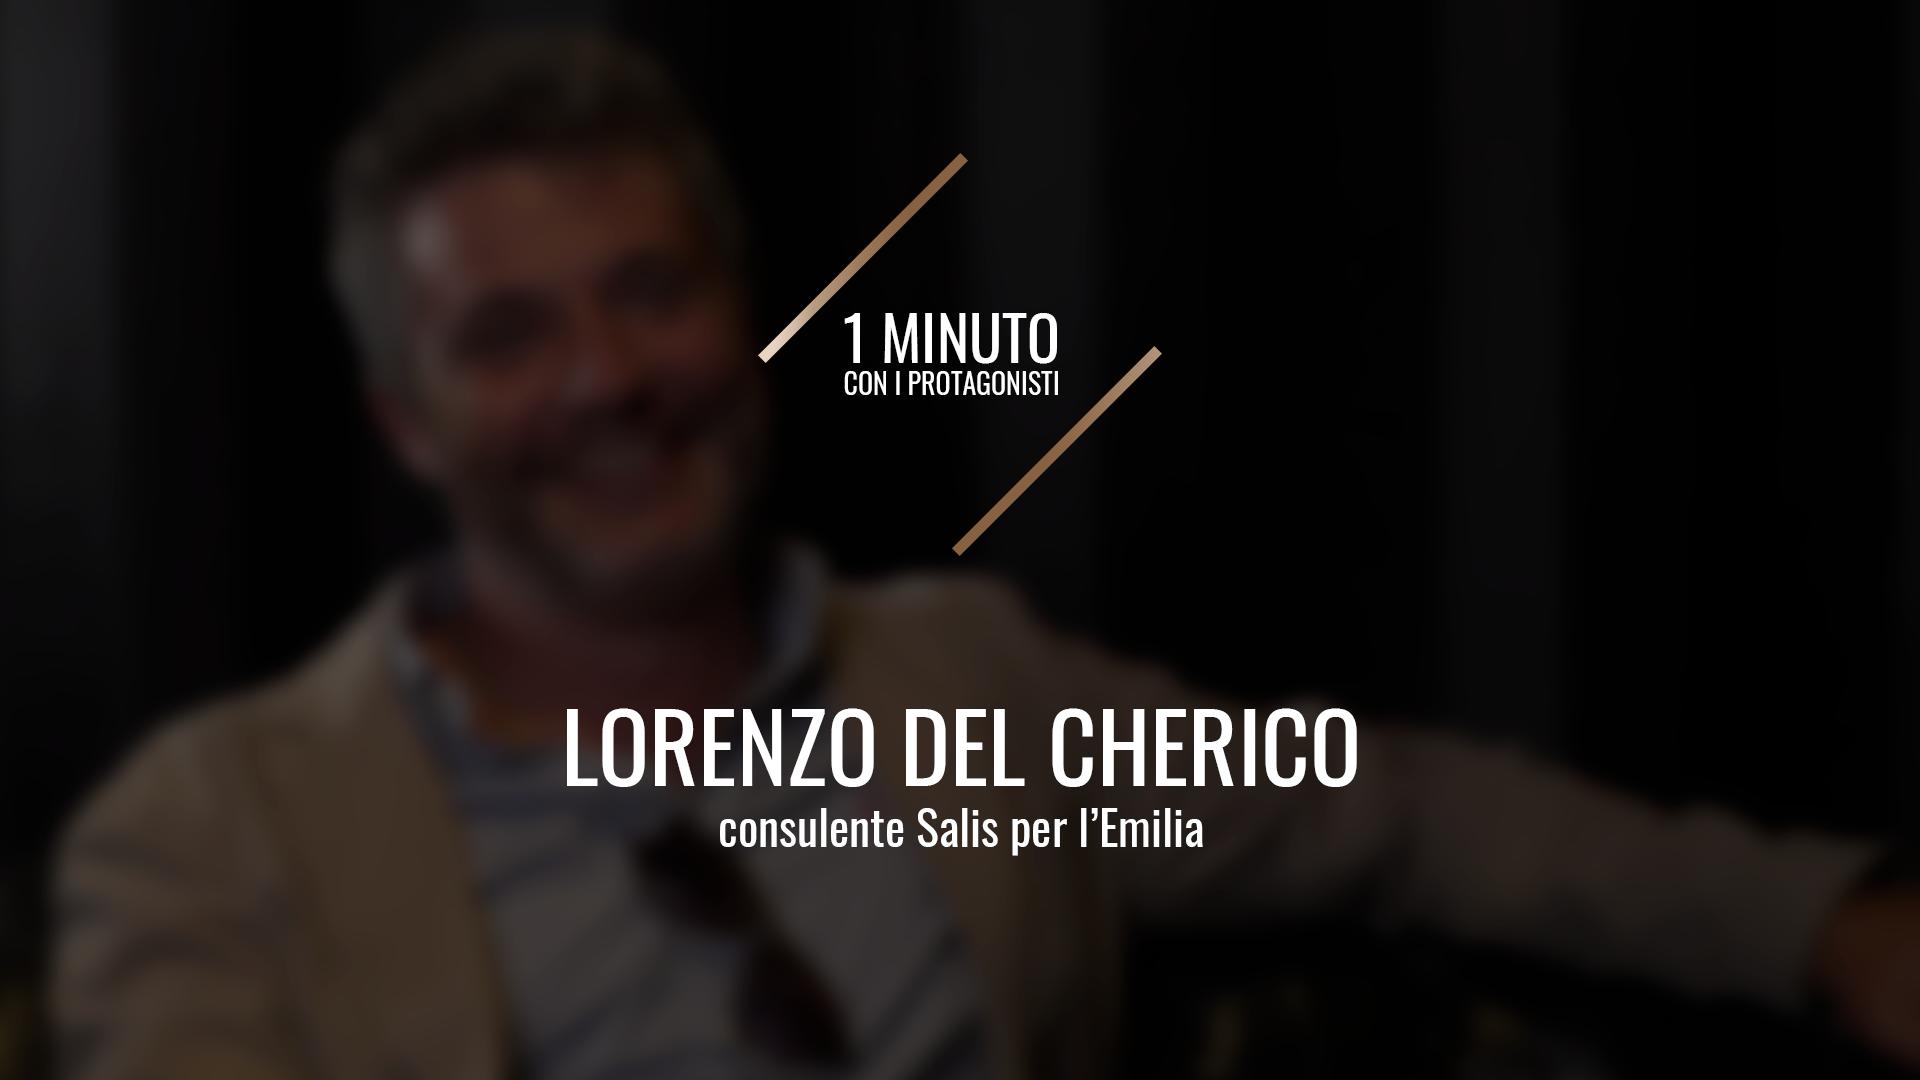 lorenzo-del-cherico-salis